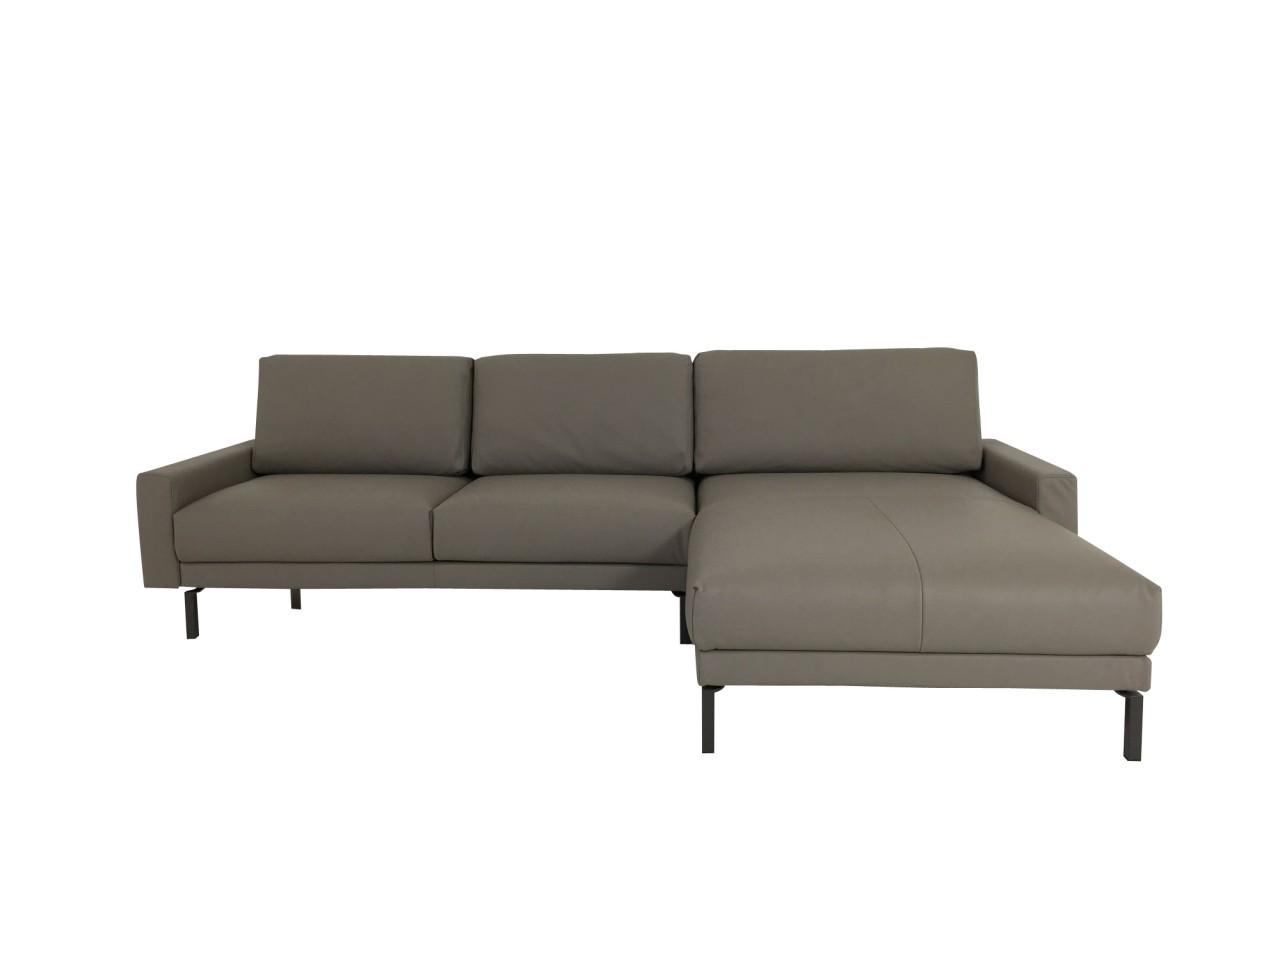 Hülsta Sofa hs.450 Sofa mit Recamiere in Leder Mark steingrau mit Quadratrohr Füssen in umbragrau